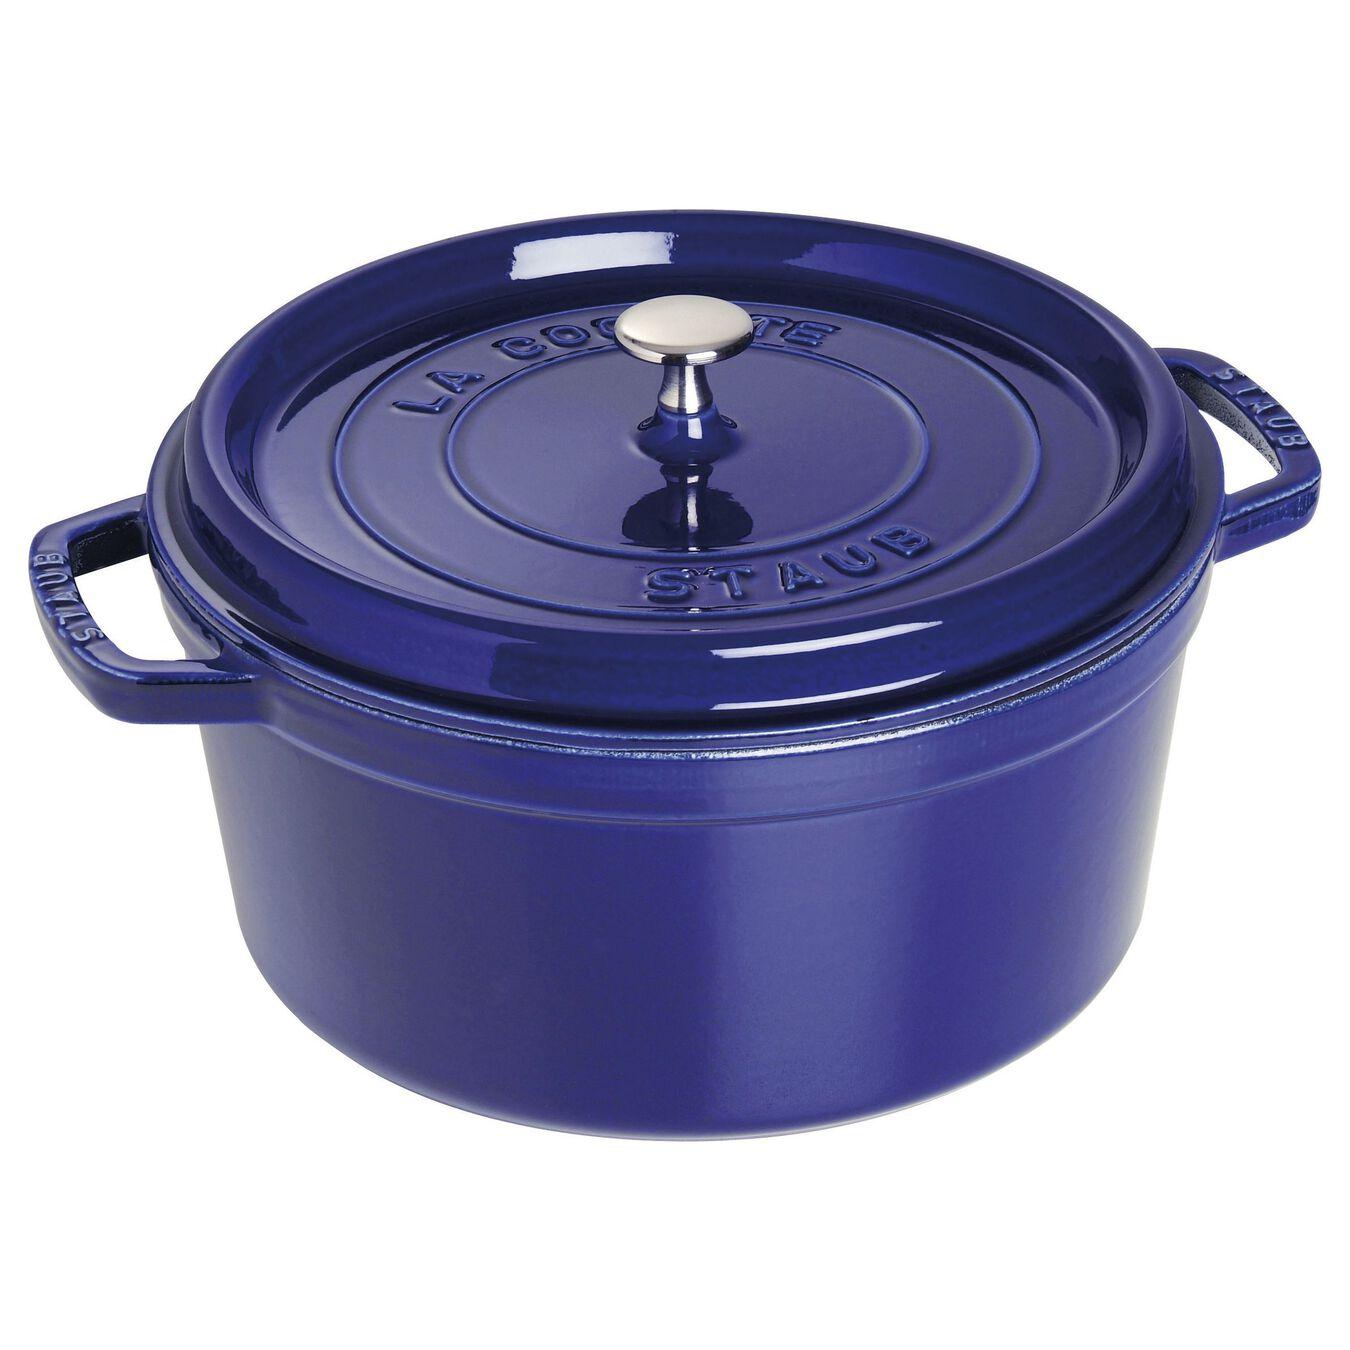 6.75 l round Cocotte, dark-blue,,large 1